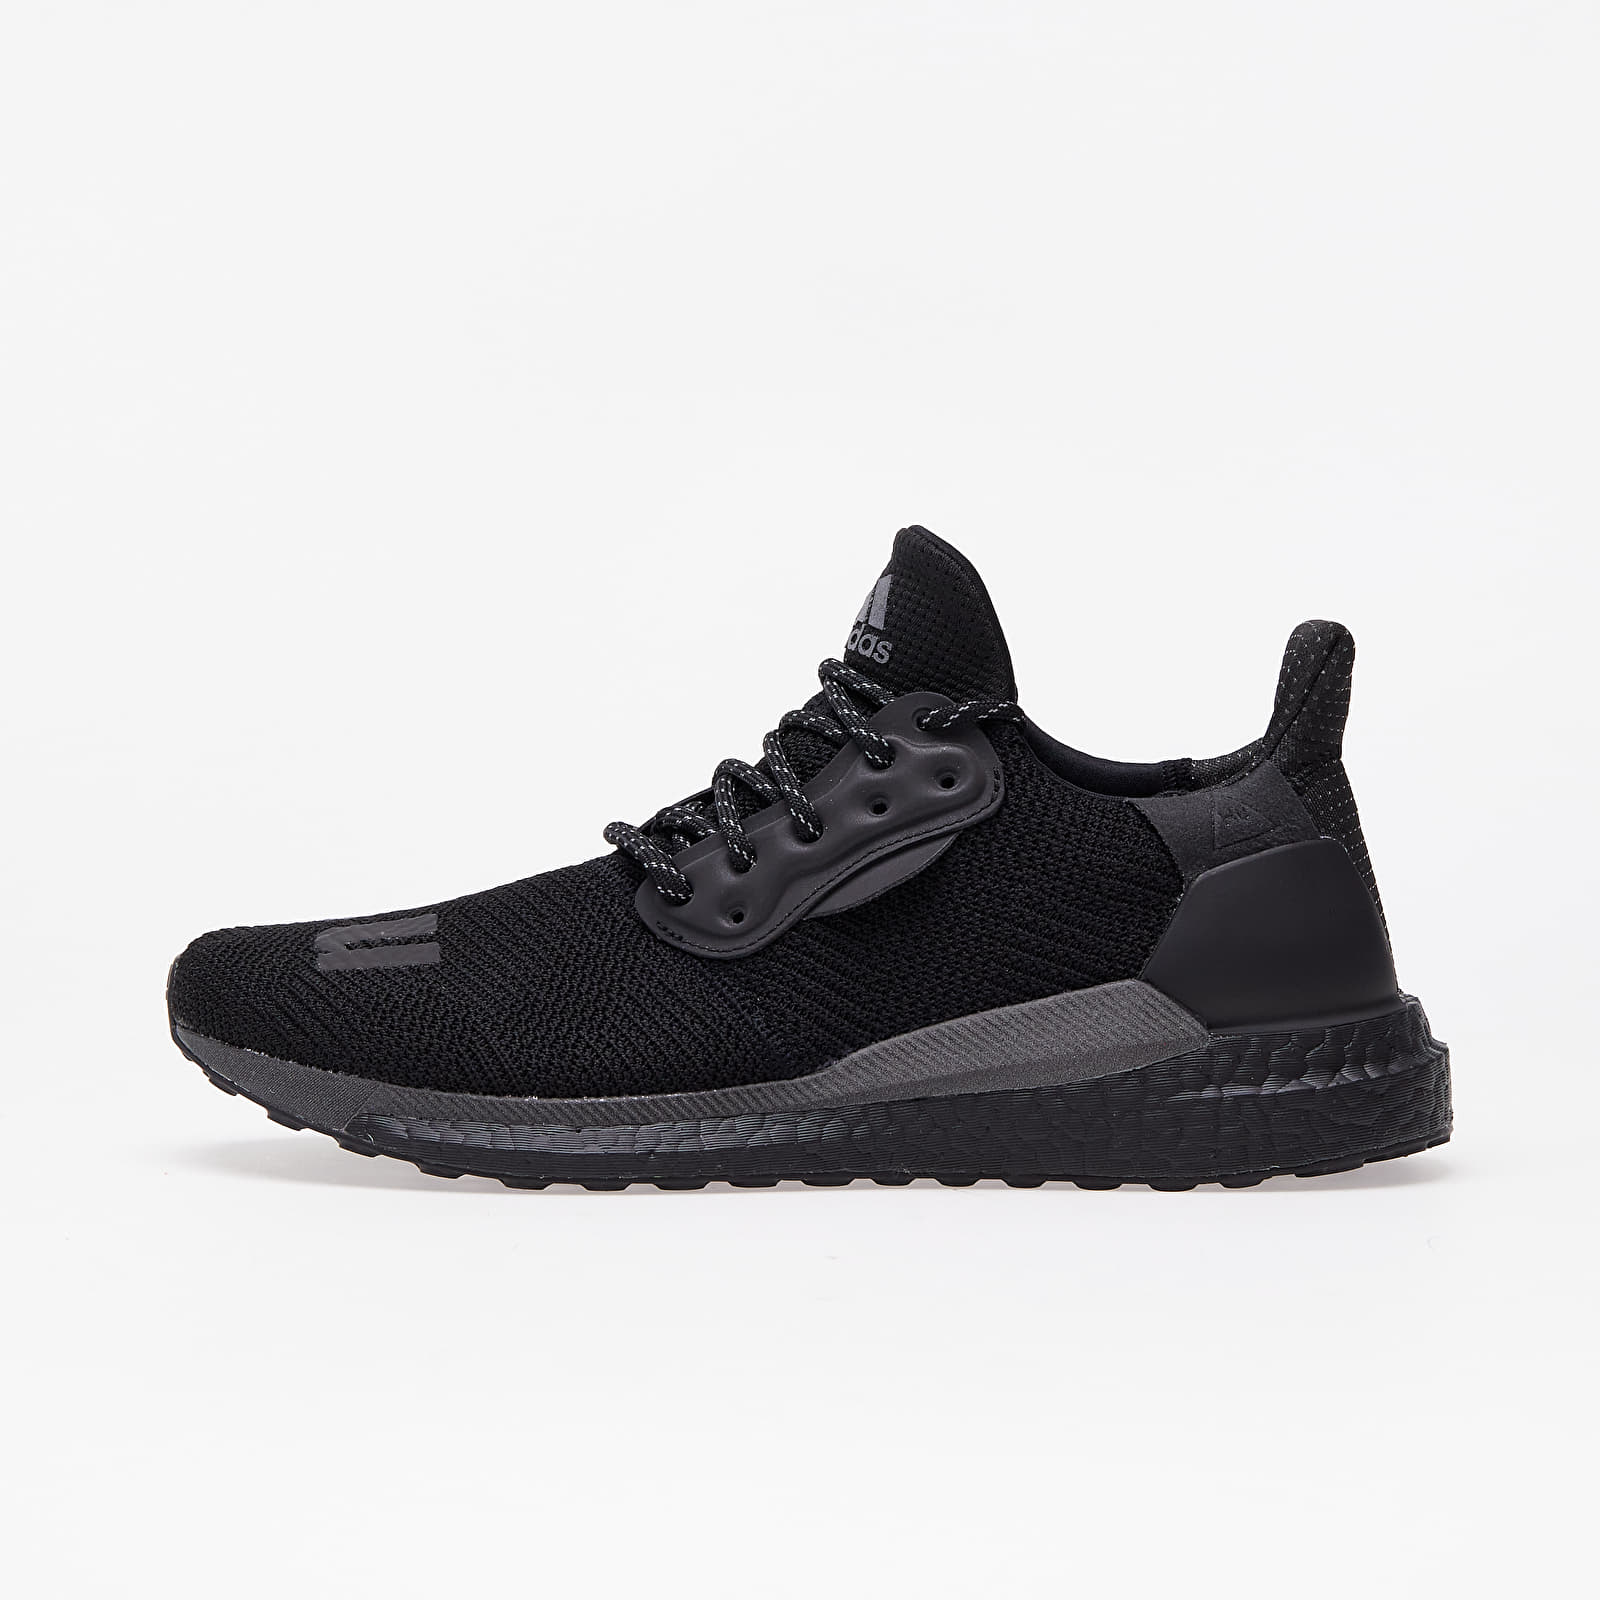 adidas x Pharrell Williams Solar HU Core Black/ Core Black/ Utility Black GX2485